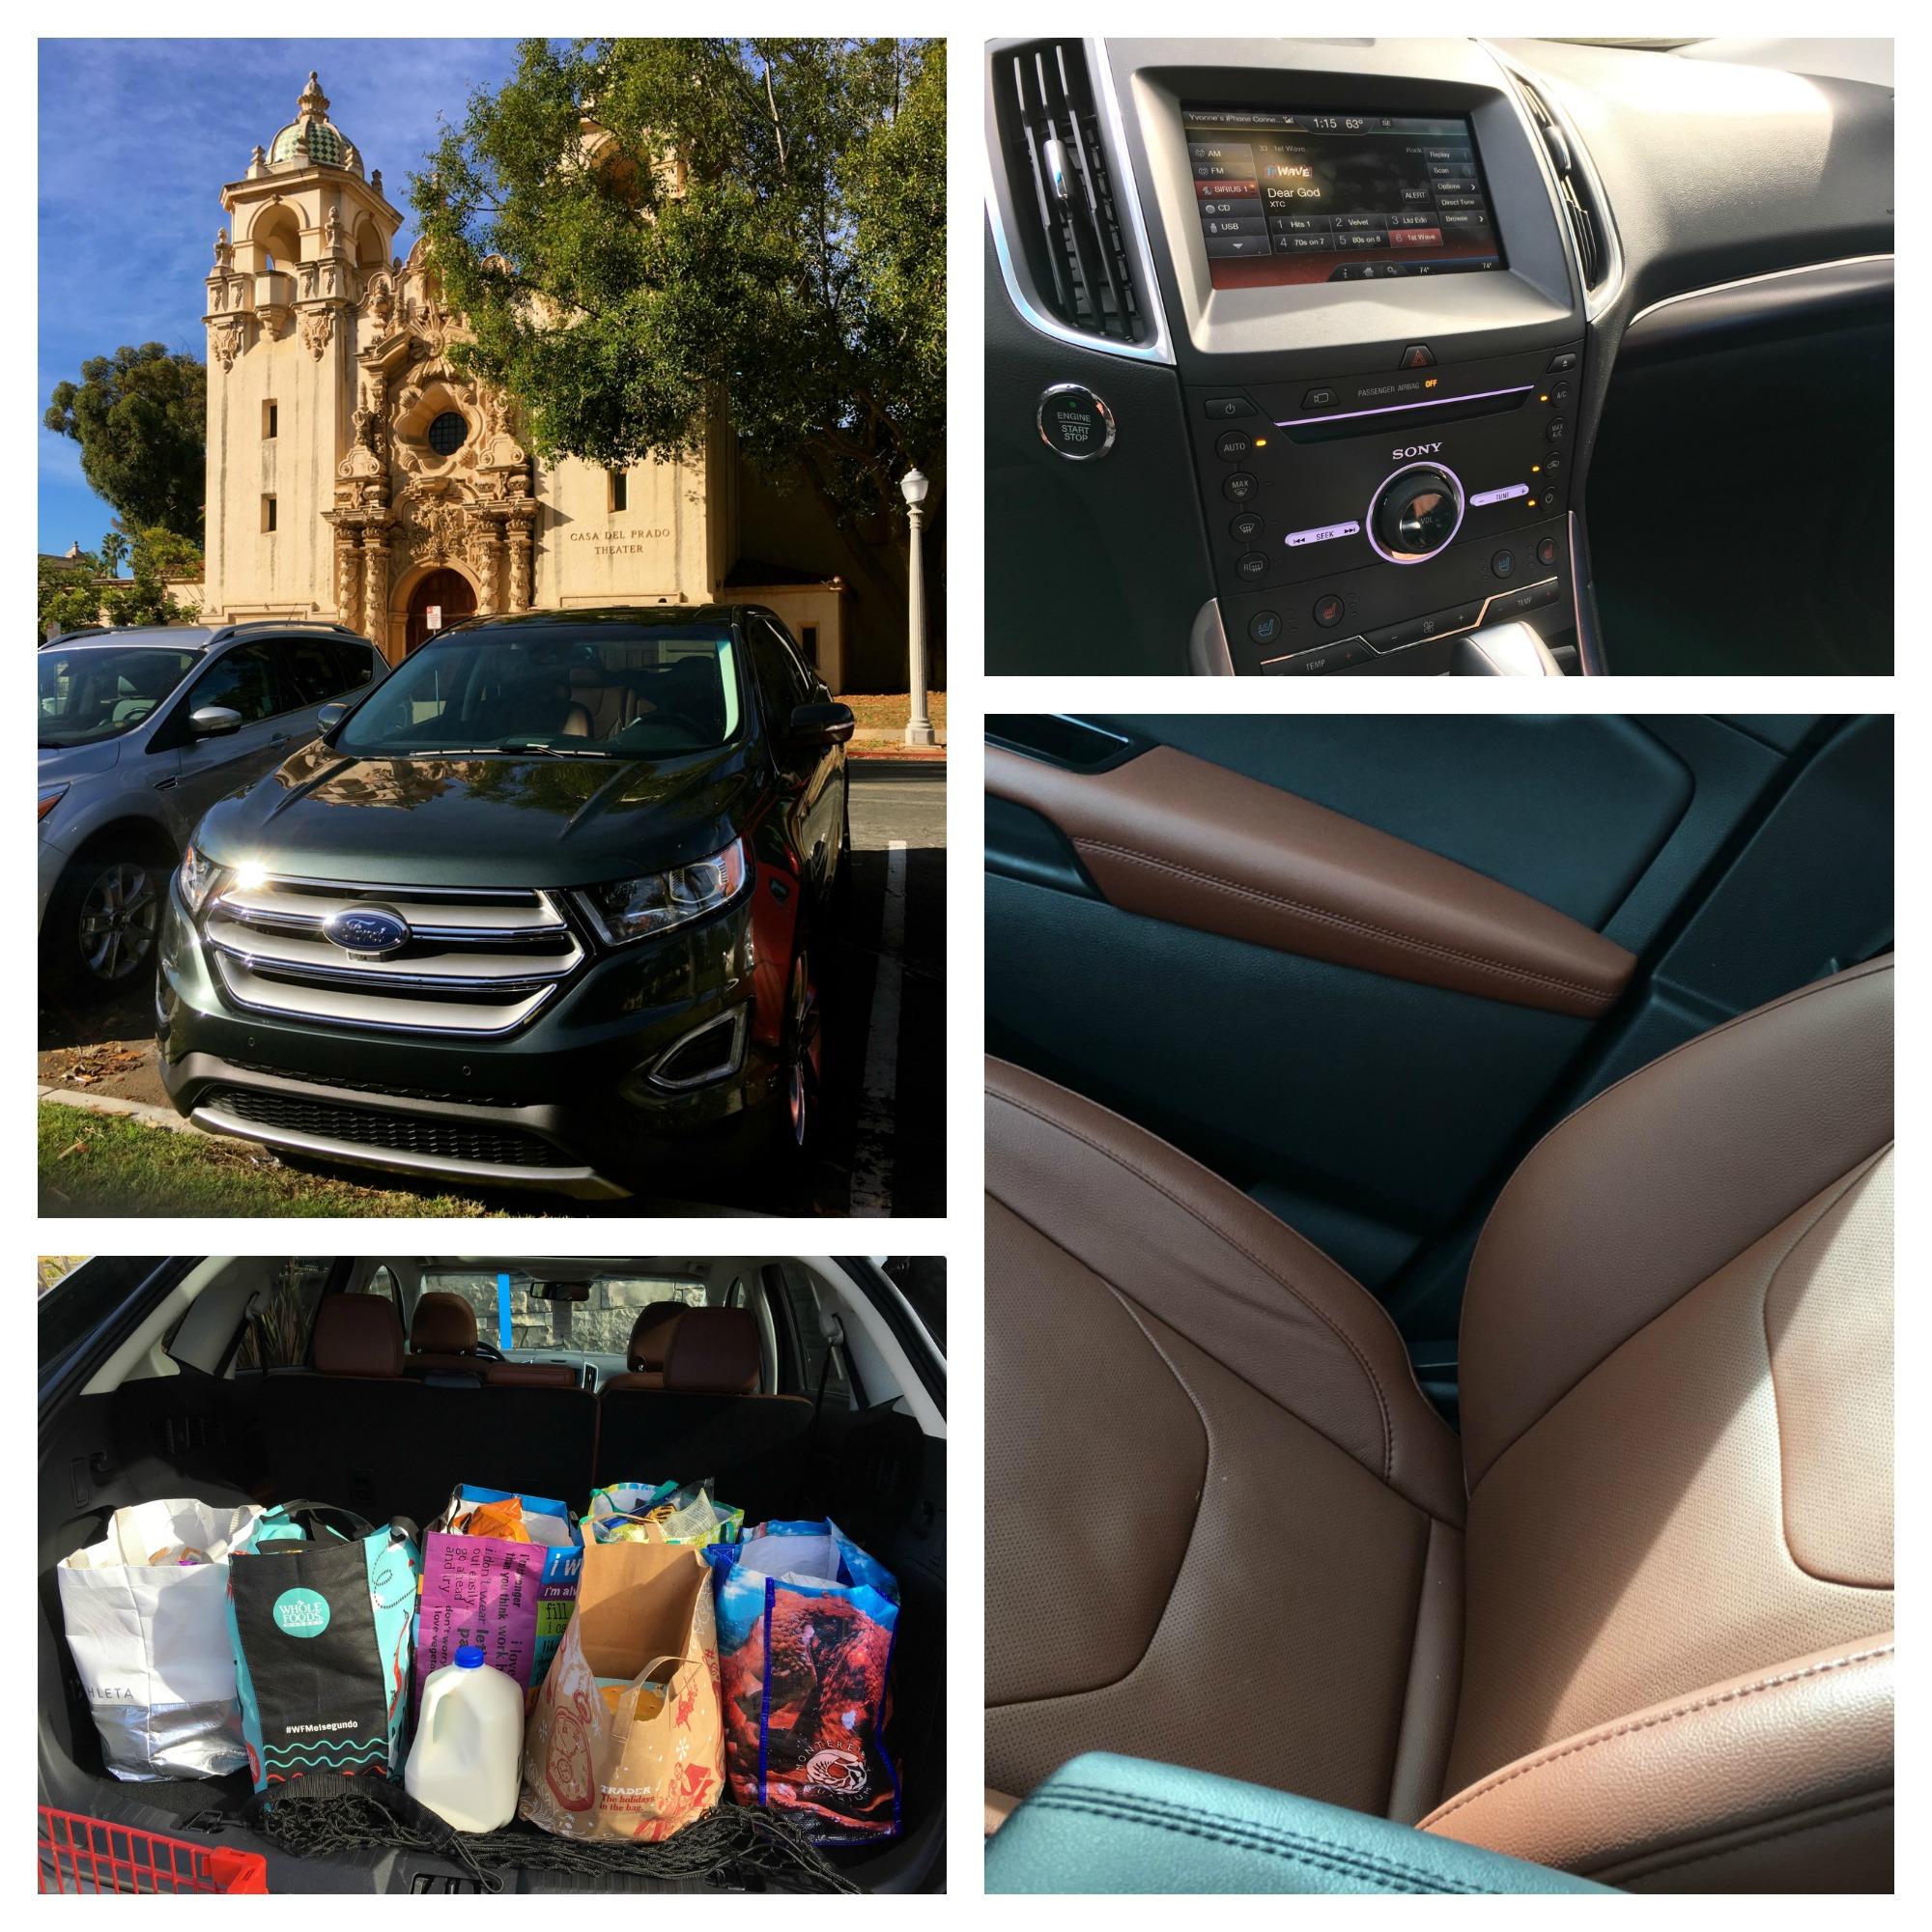 Ford Edge - Road trip to Tucson